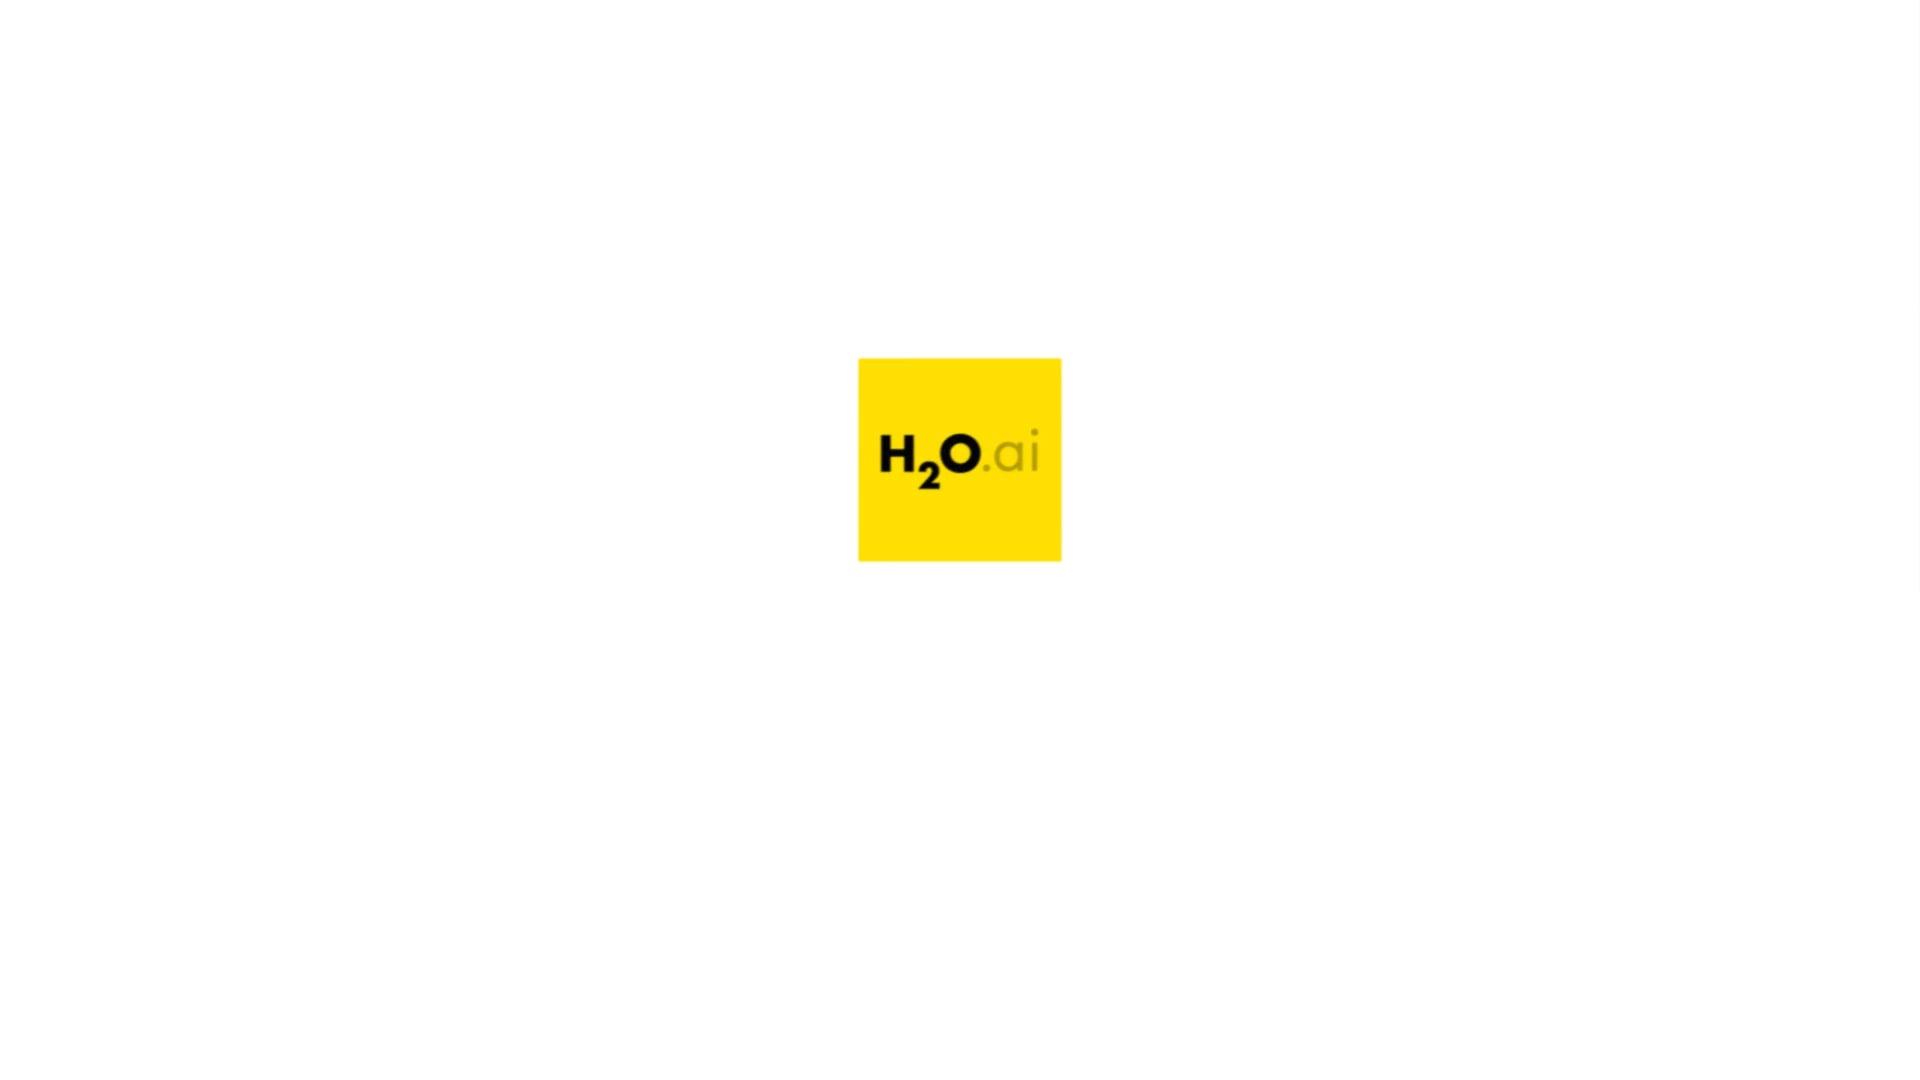 H2O.ai : Origin